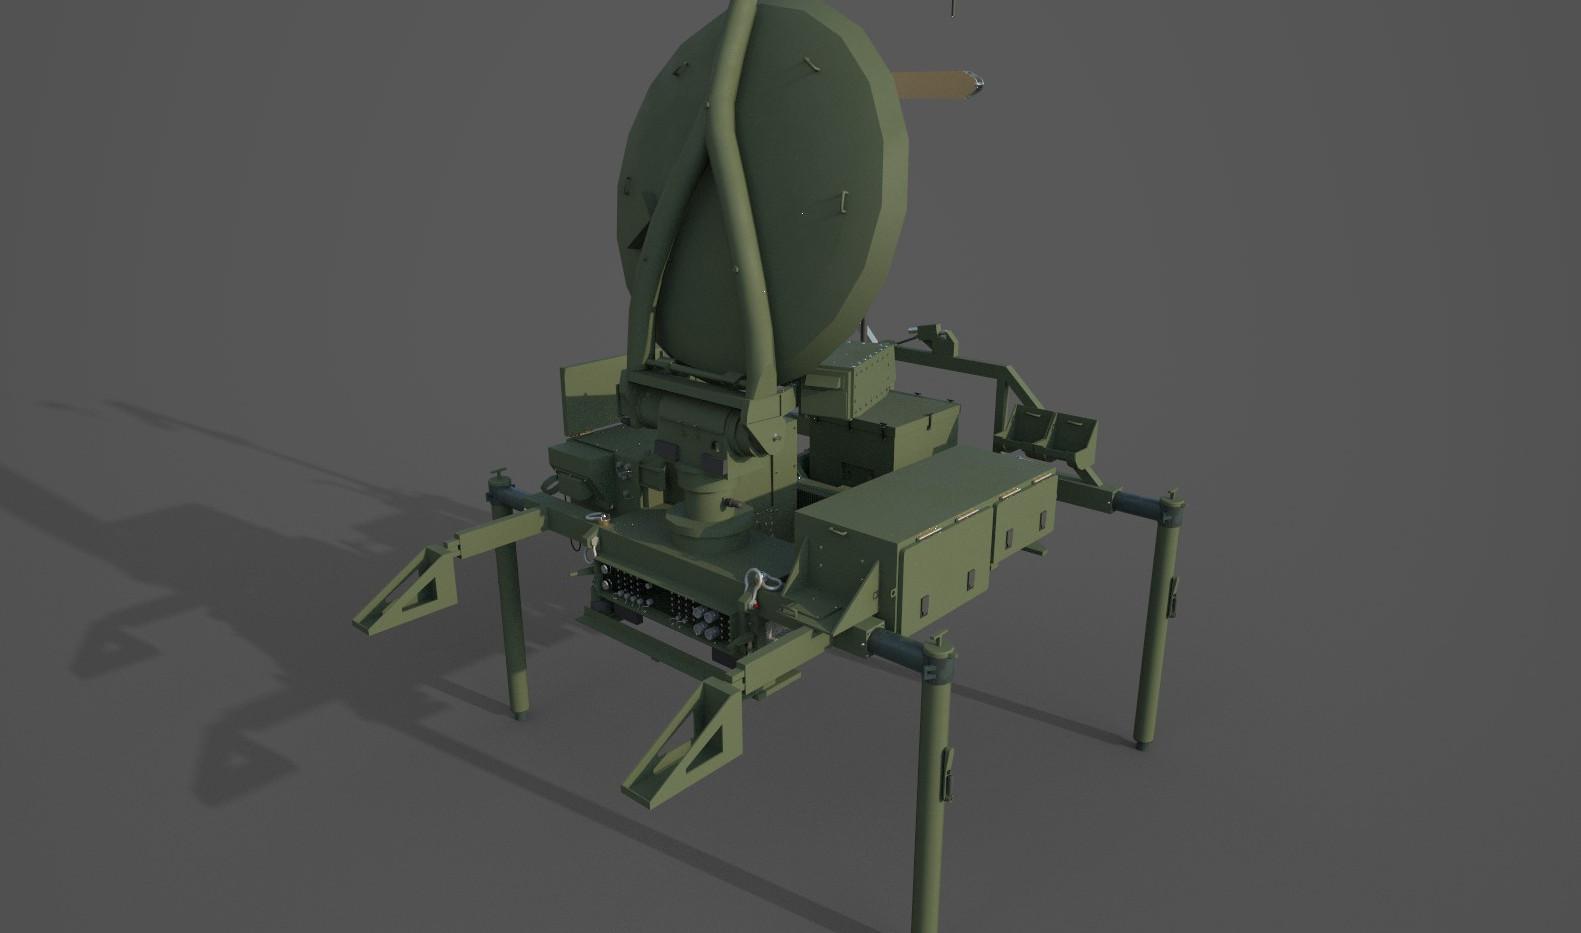 Smart-T Satellite Render 3.jpg